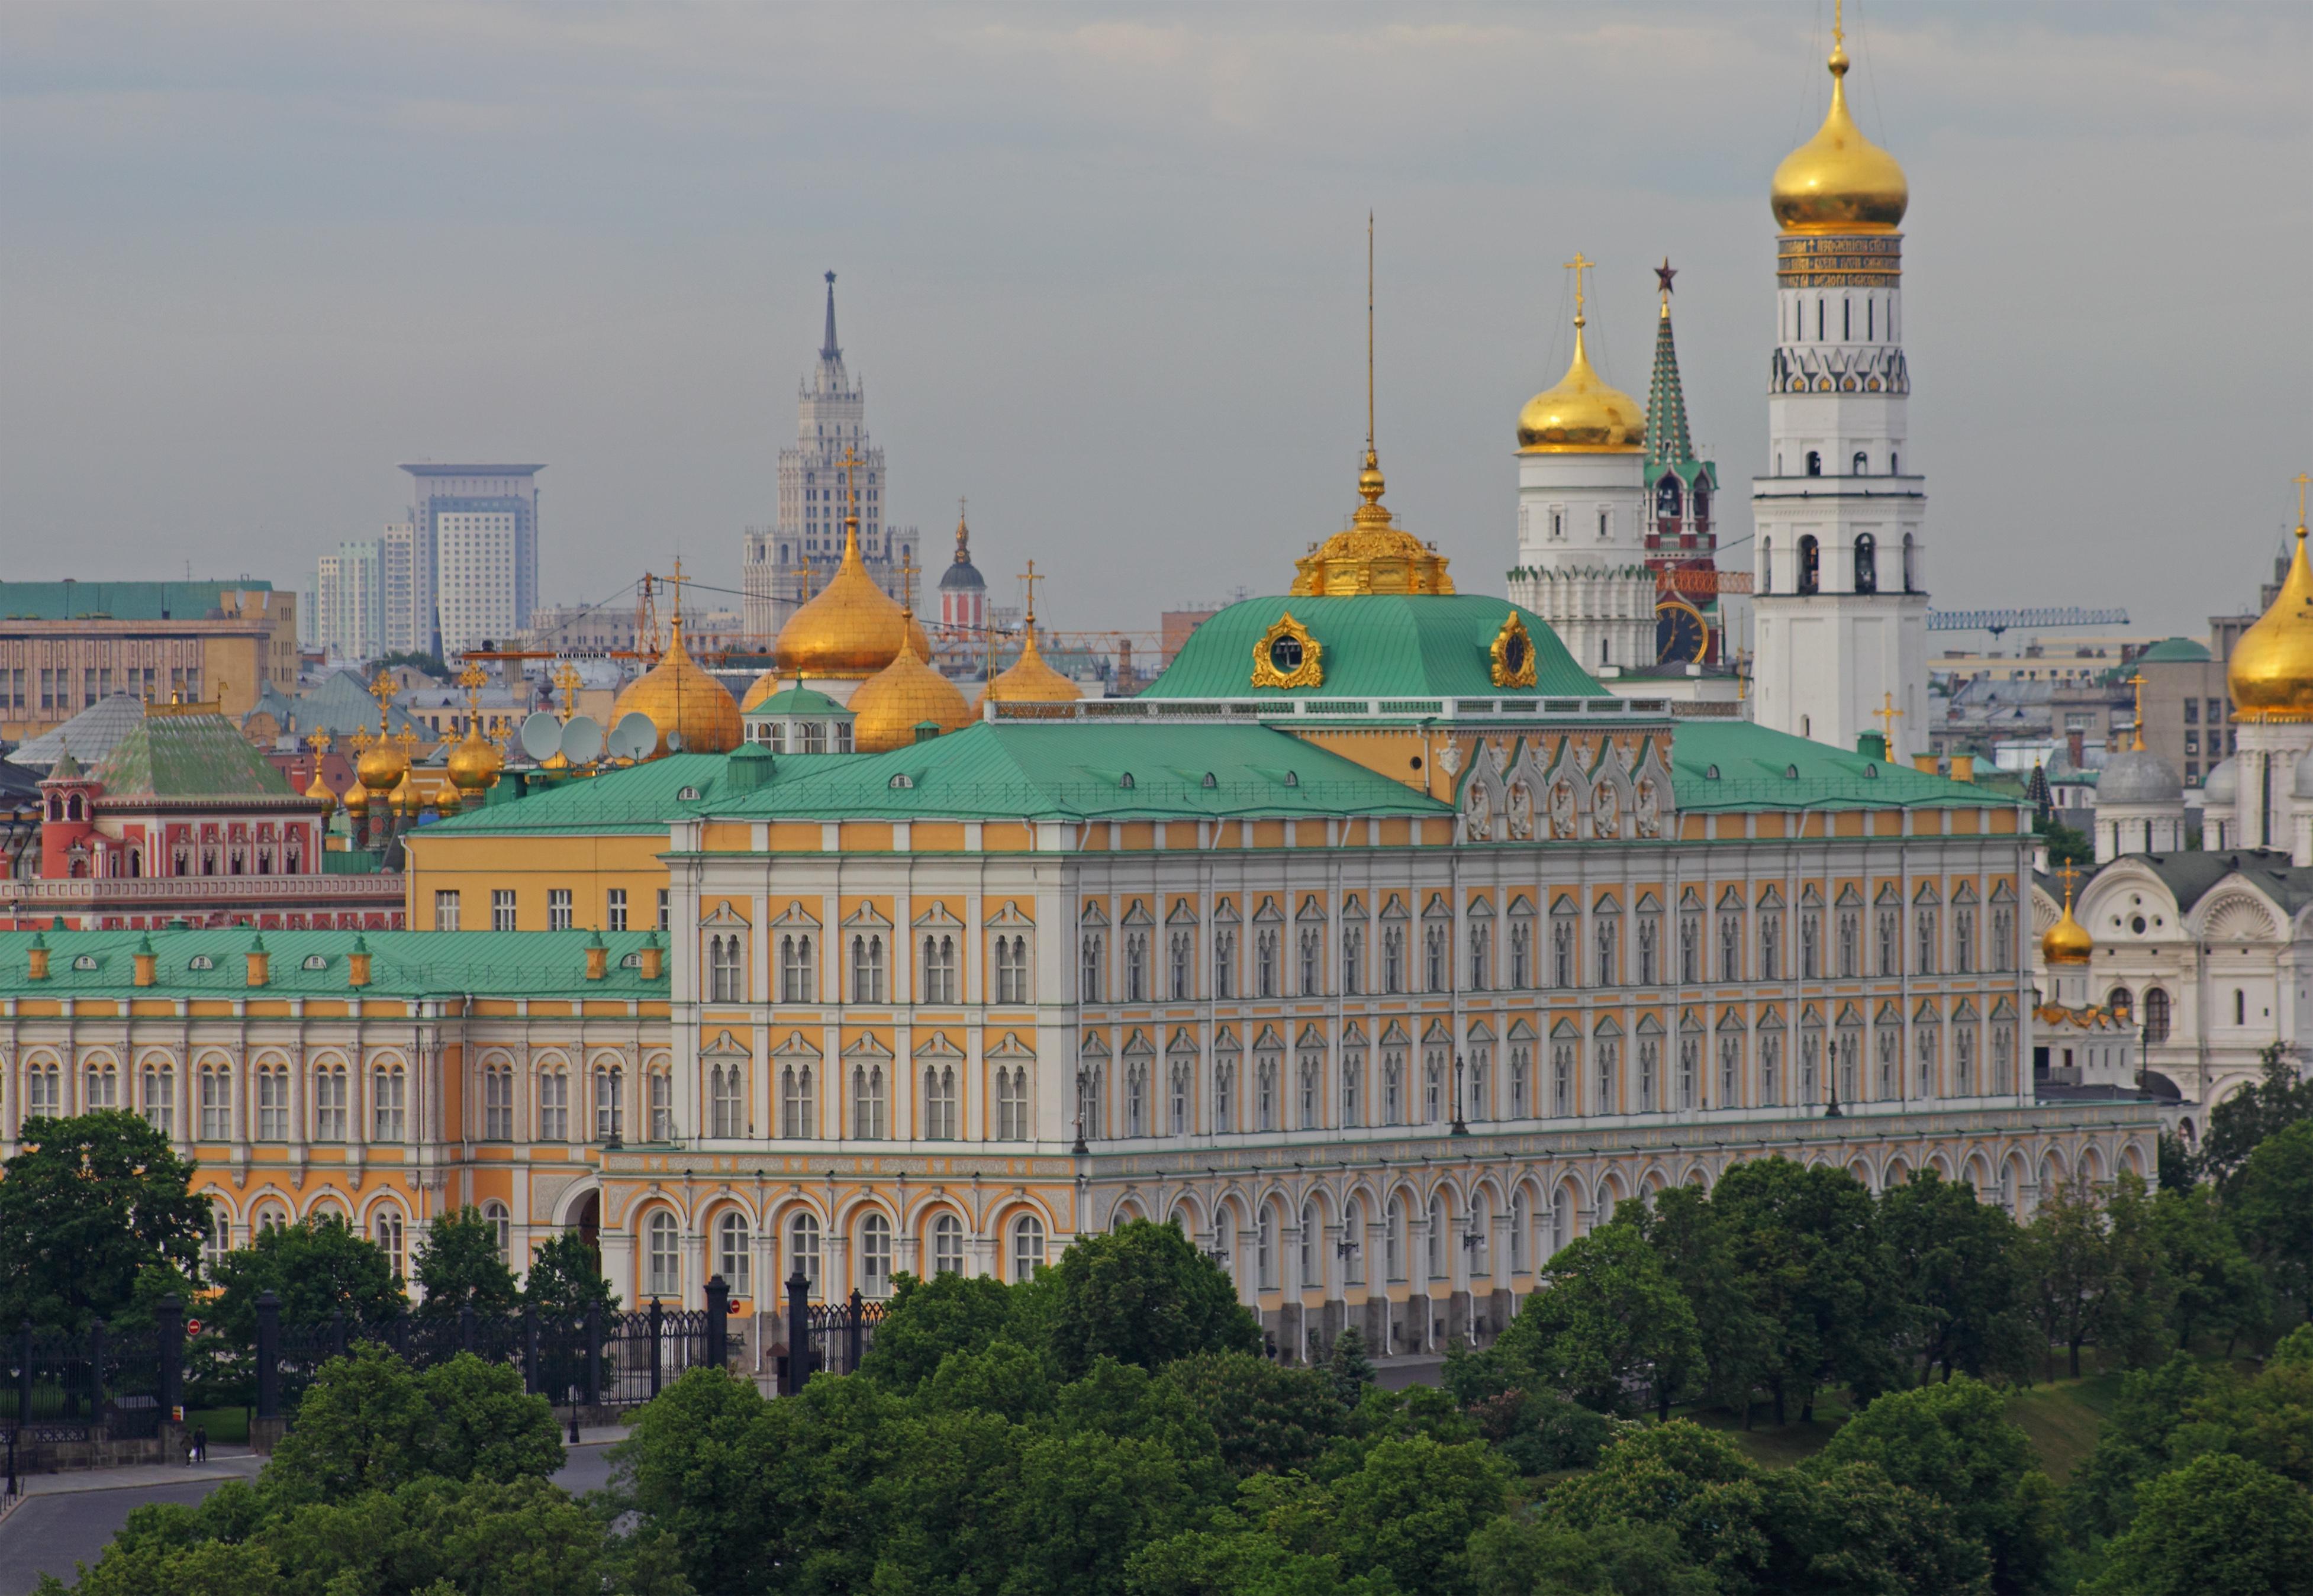 [Obrazek: Moscow_05-2012_Kremlin_23.jpg]